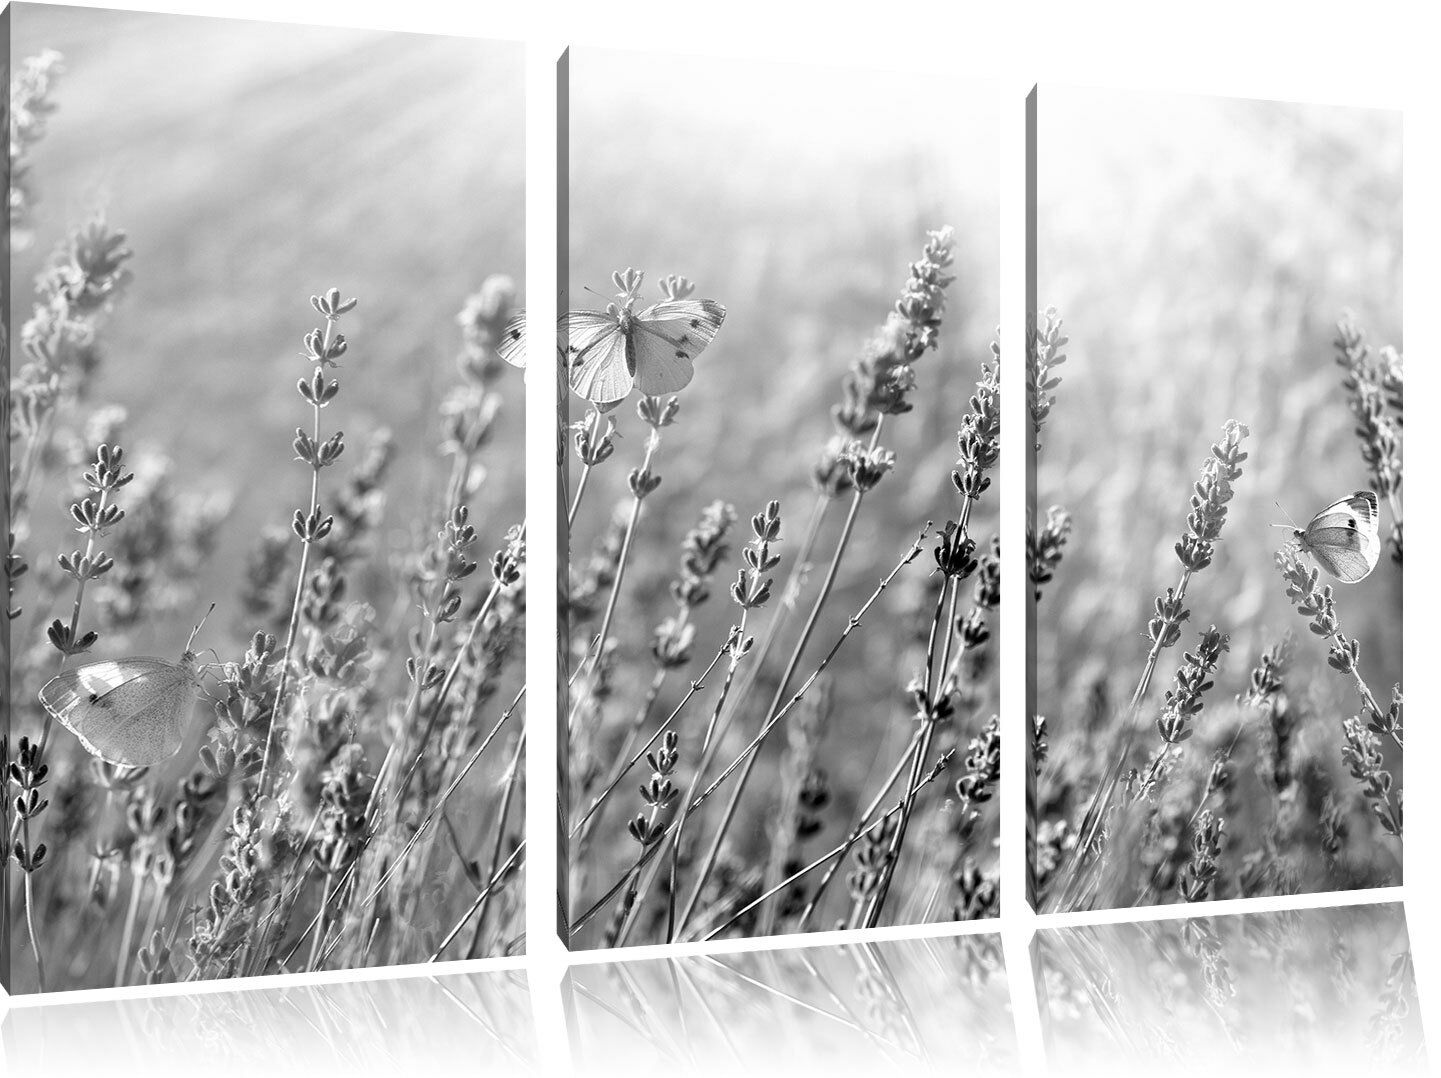 Mariposas Lienzo Auf Lavendelblumen Arte BW 3-Teiler Foto en Lienzo Mariposas Decoración de fd58b1